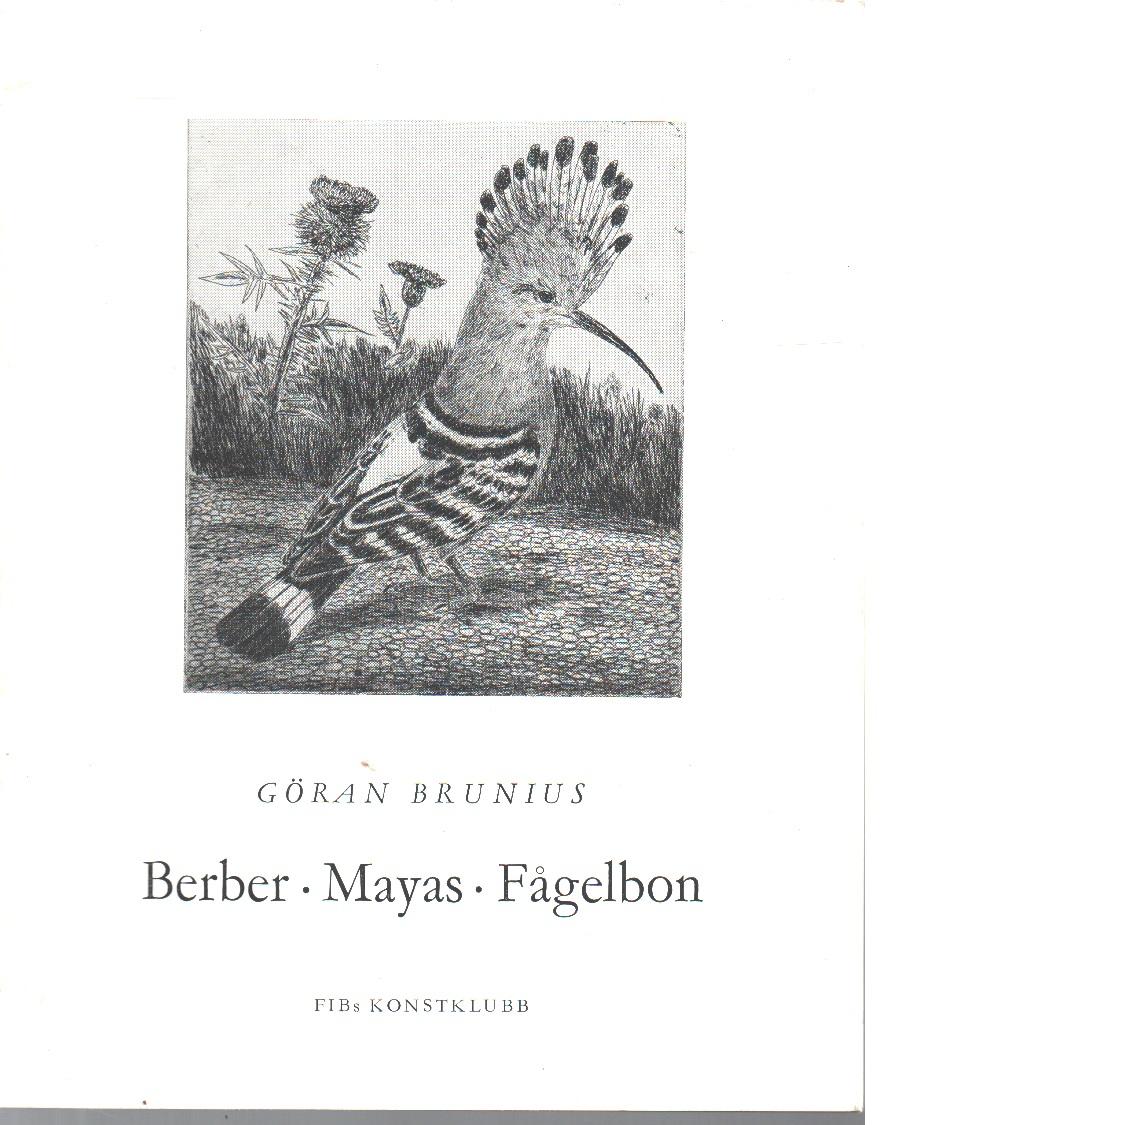 Berber, mayas, fågelbon - Brunius, Göran